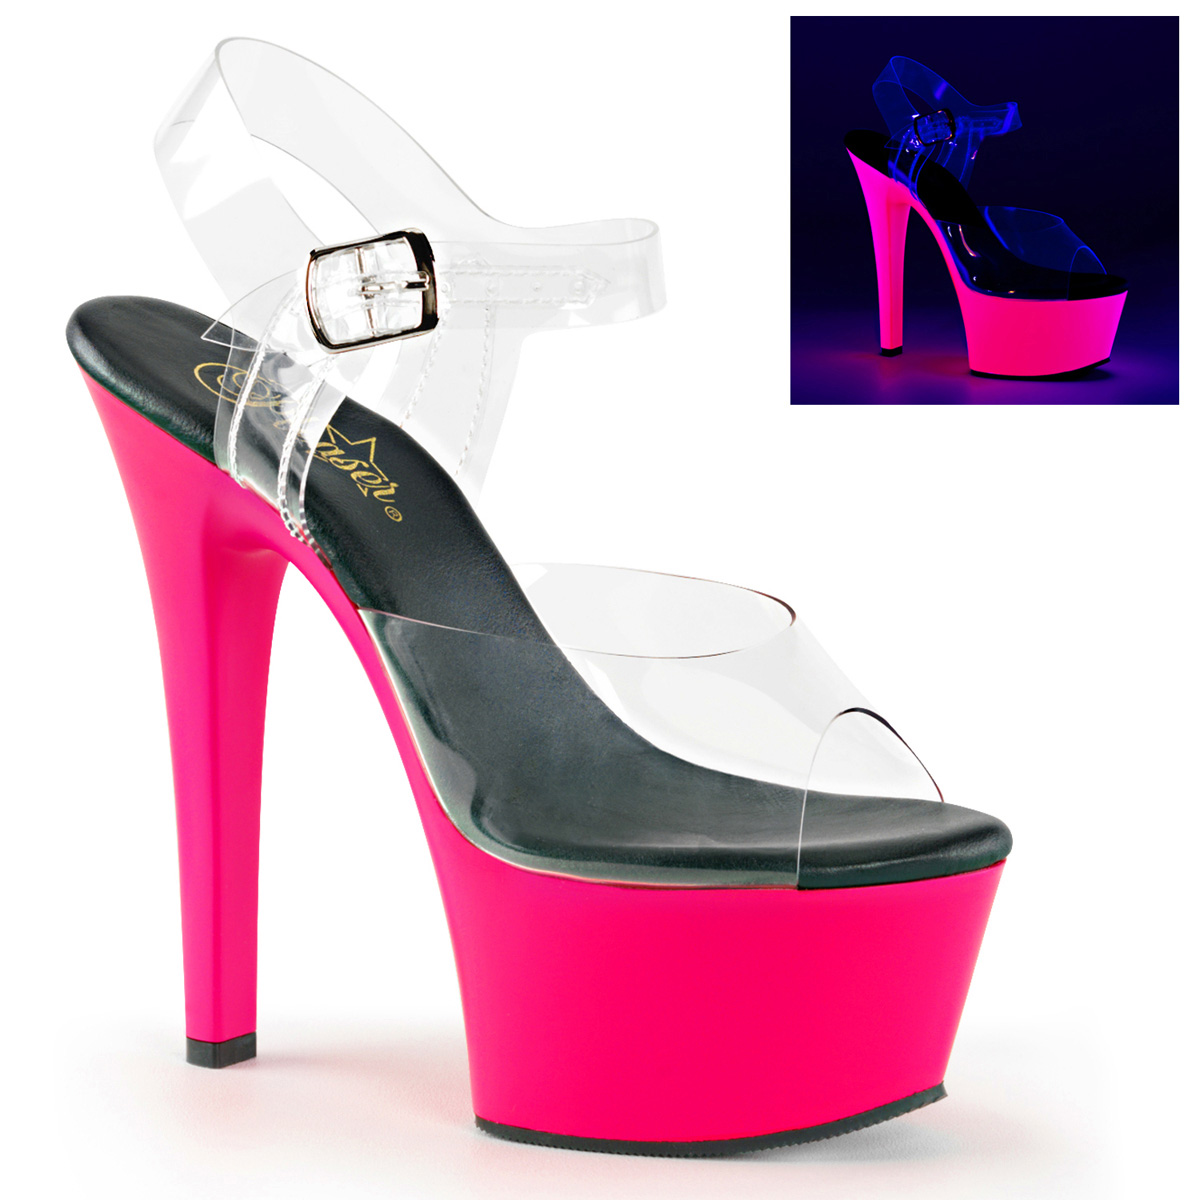 PLEASER ASPIRE-608UV Women's High Platform Neon UV Reactive Ankle Strap Sandals